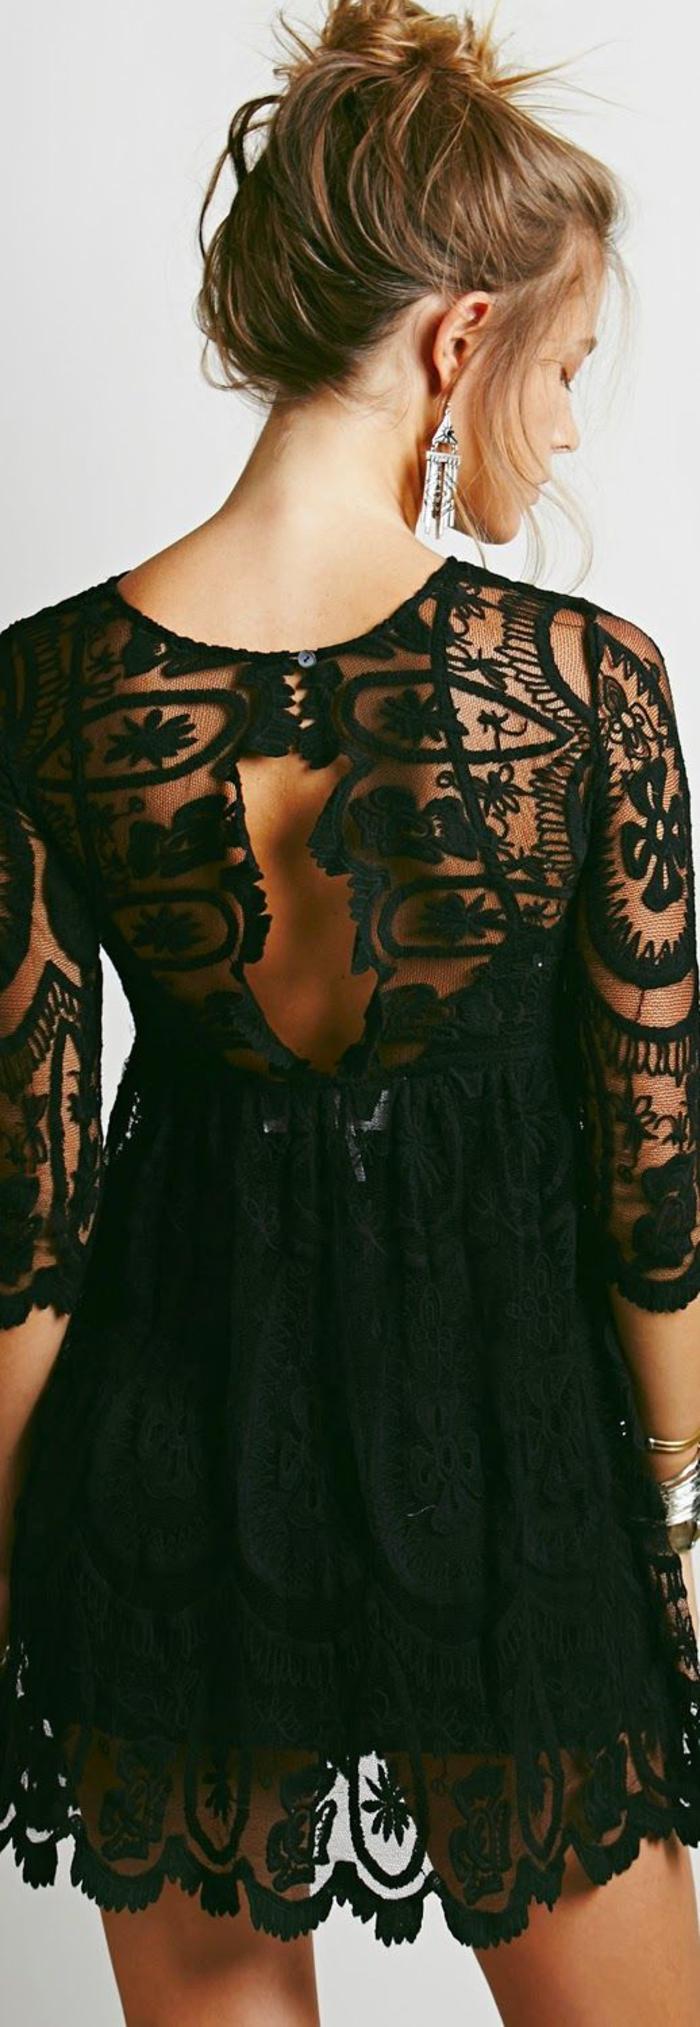 schwarzes kleid, spitze, aermel, kurz, lange ohrringe